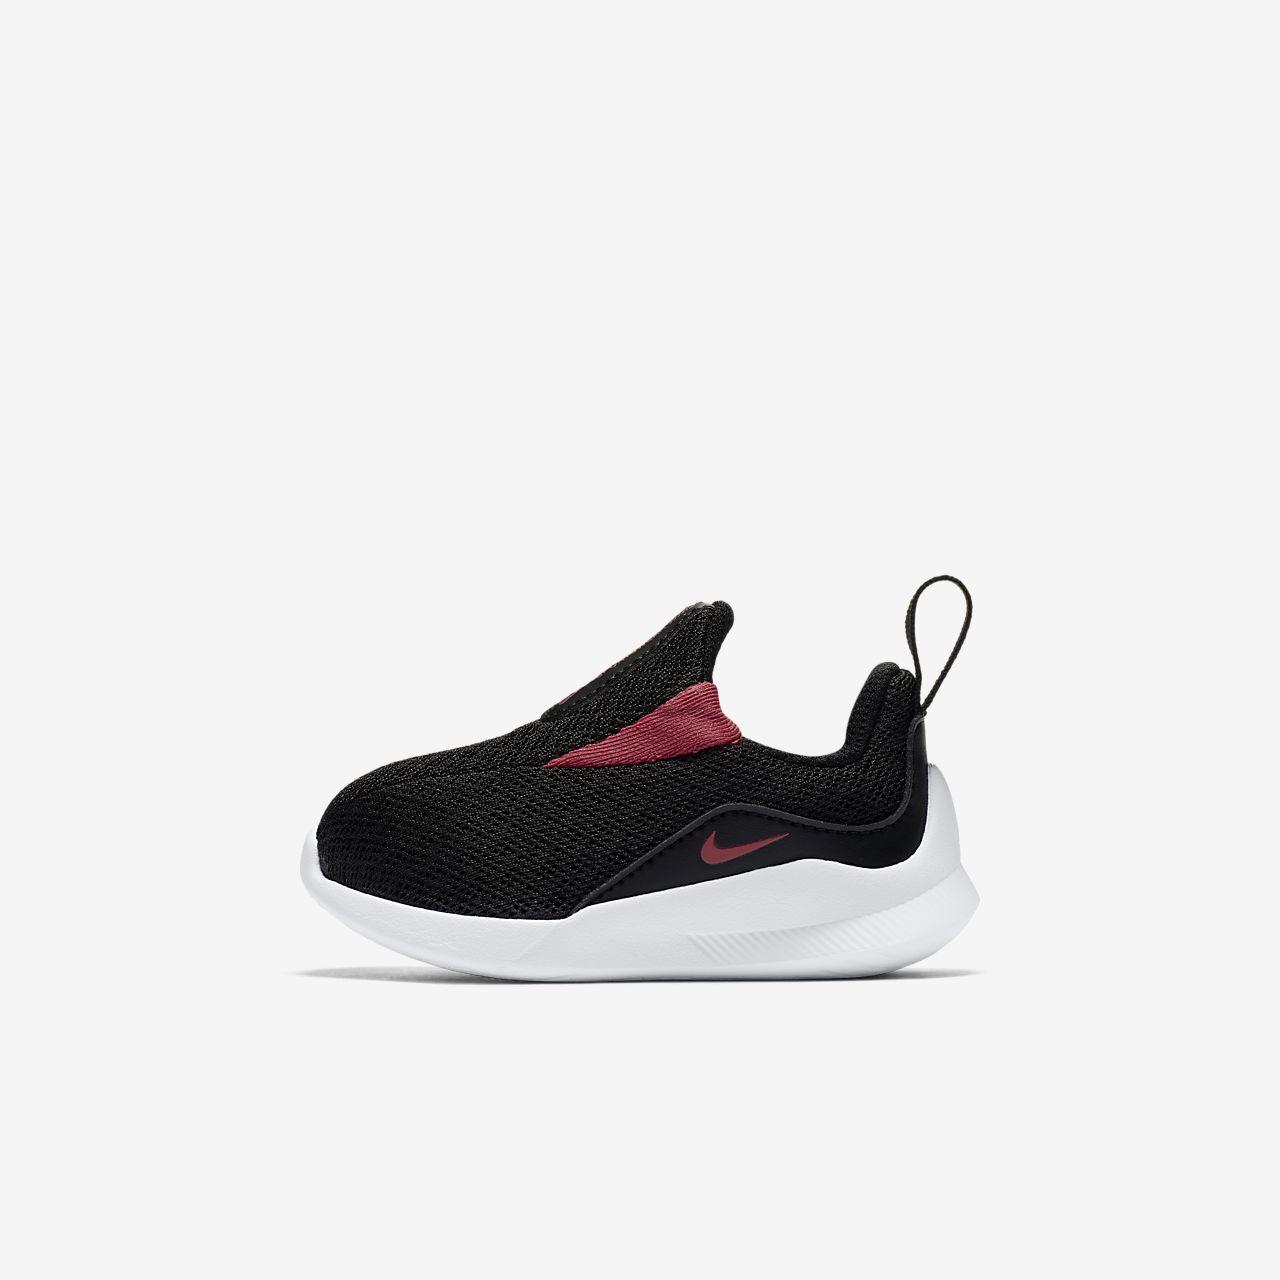 fa0c0b8d9ccc Buty dla maluchów Nike Viale. Nike.com PL